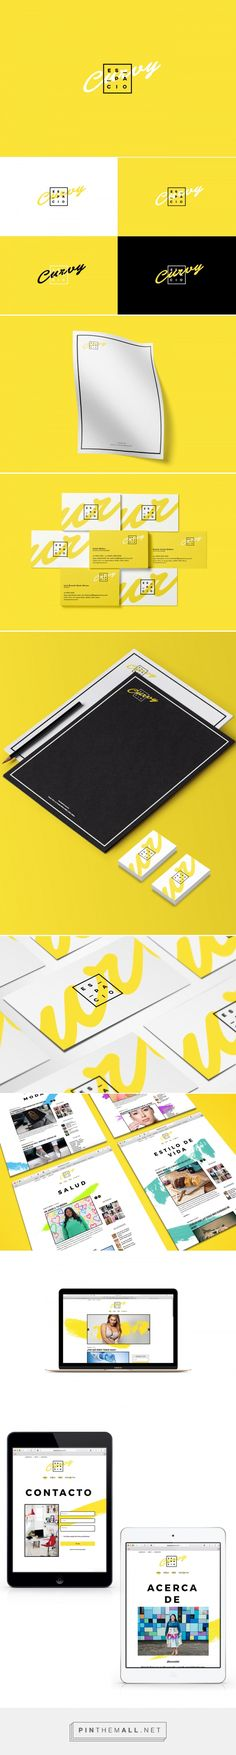 Espacio Curvy Digital Magazine Branding by Wendy Sejas | Fivestar Branding Agency – Design and Branding Agency & Curated Inspiration Gallery